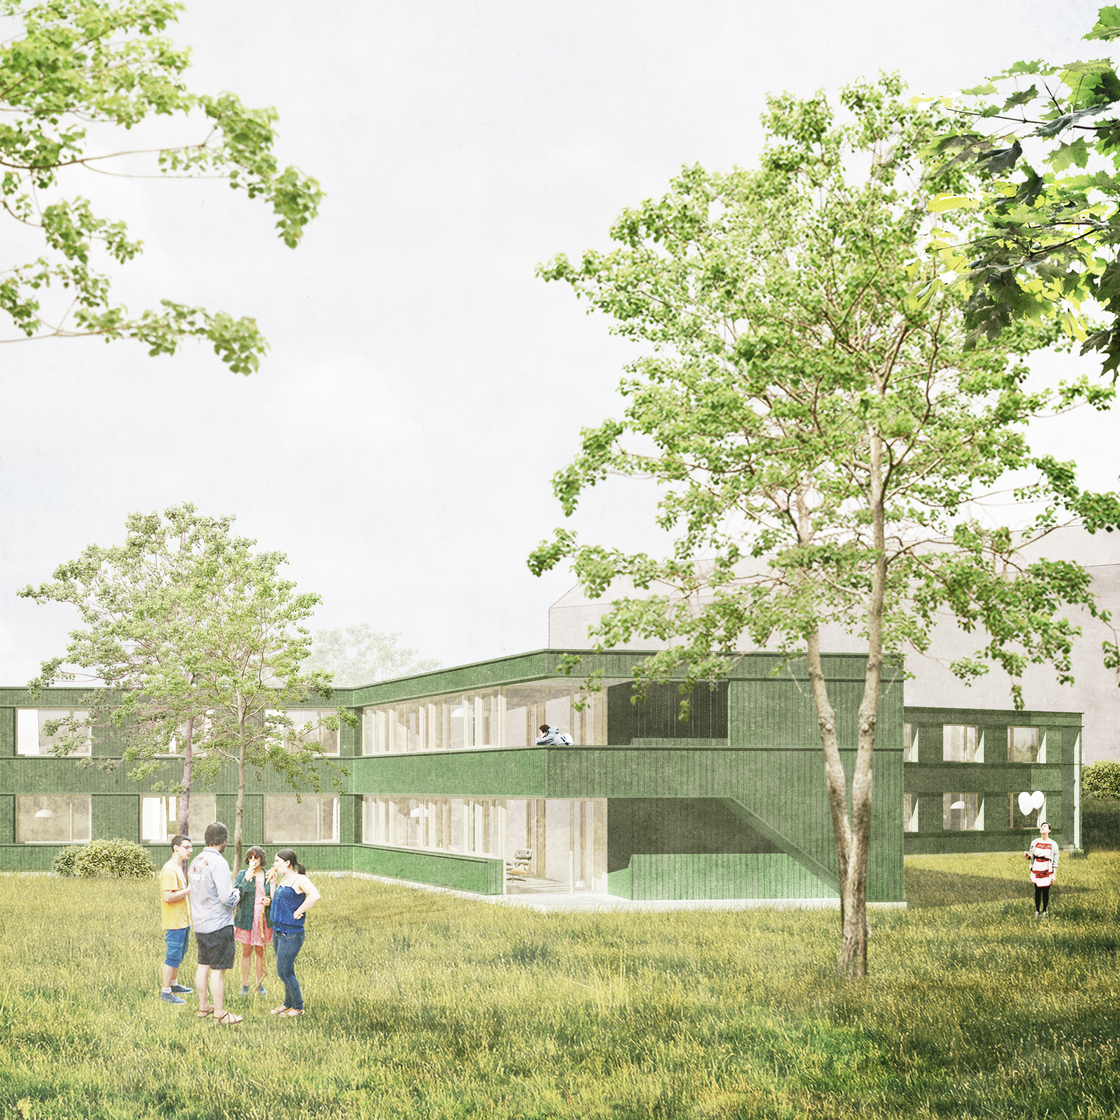 Ffm-Sossenheim Kinderhaus Frank Perspektive